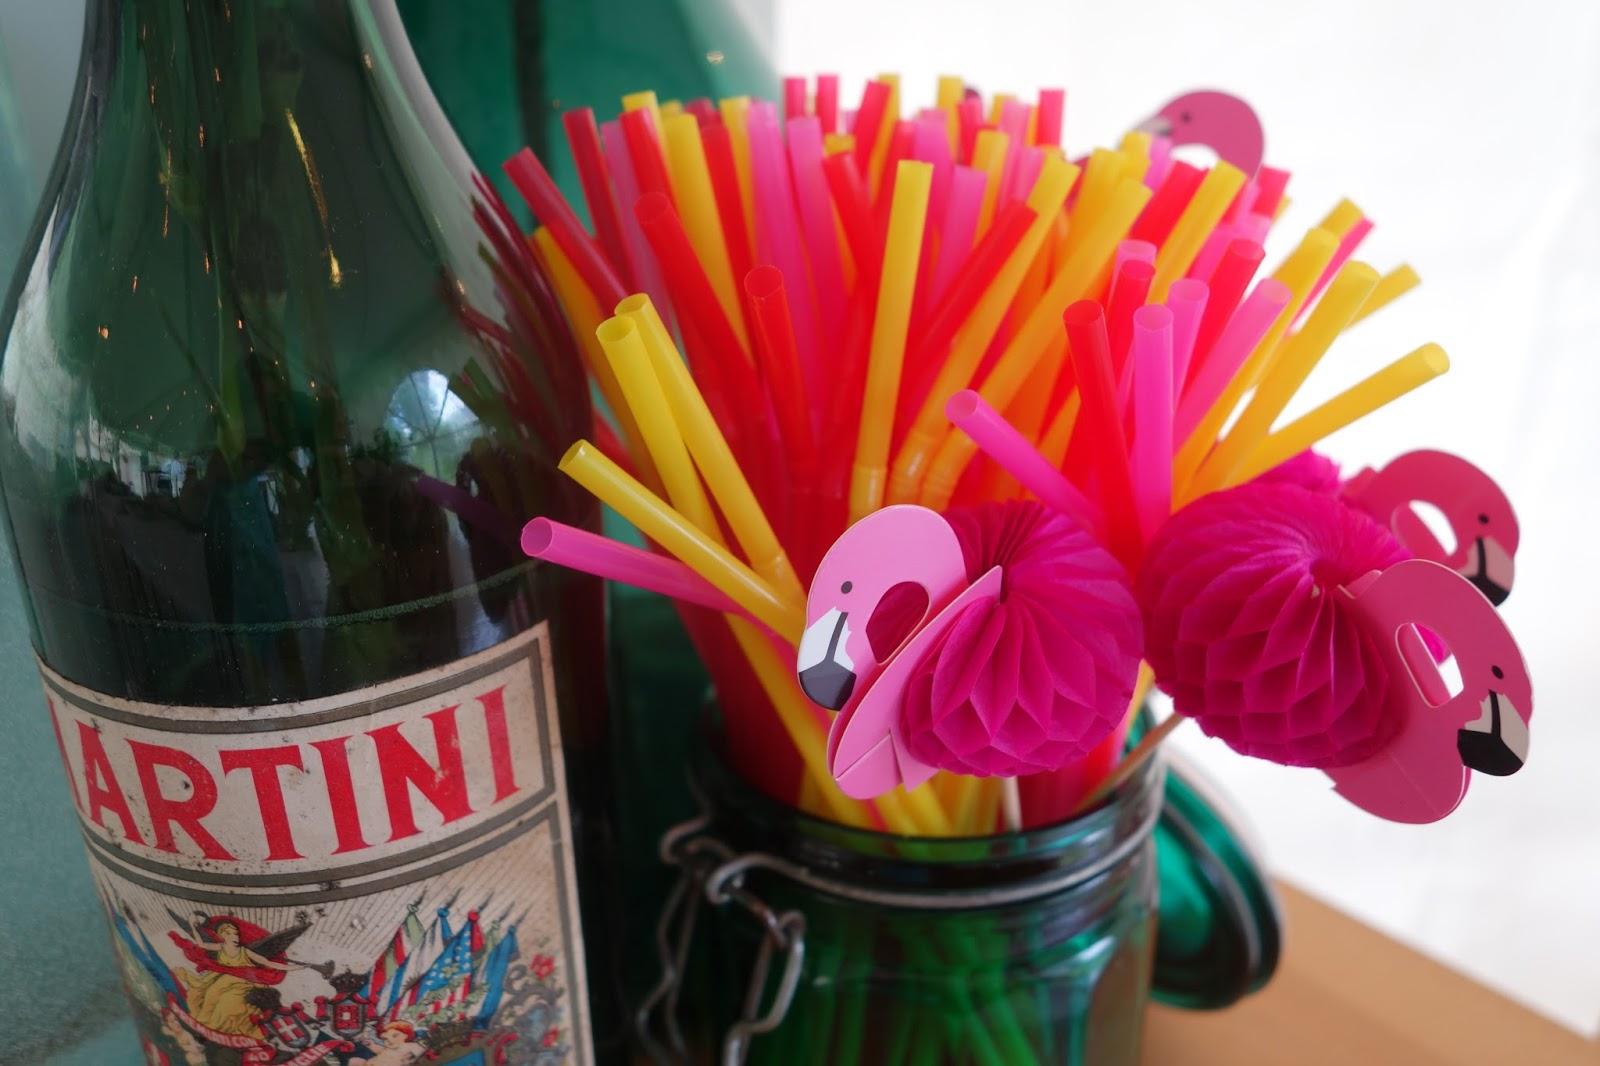 Pengarellerpyssel blog for Alkohol dekoration